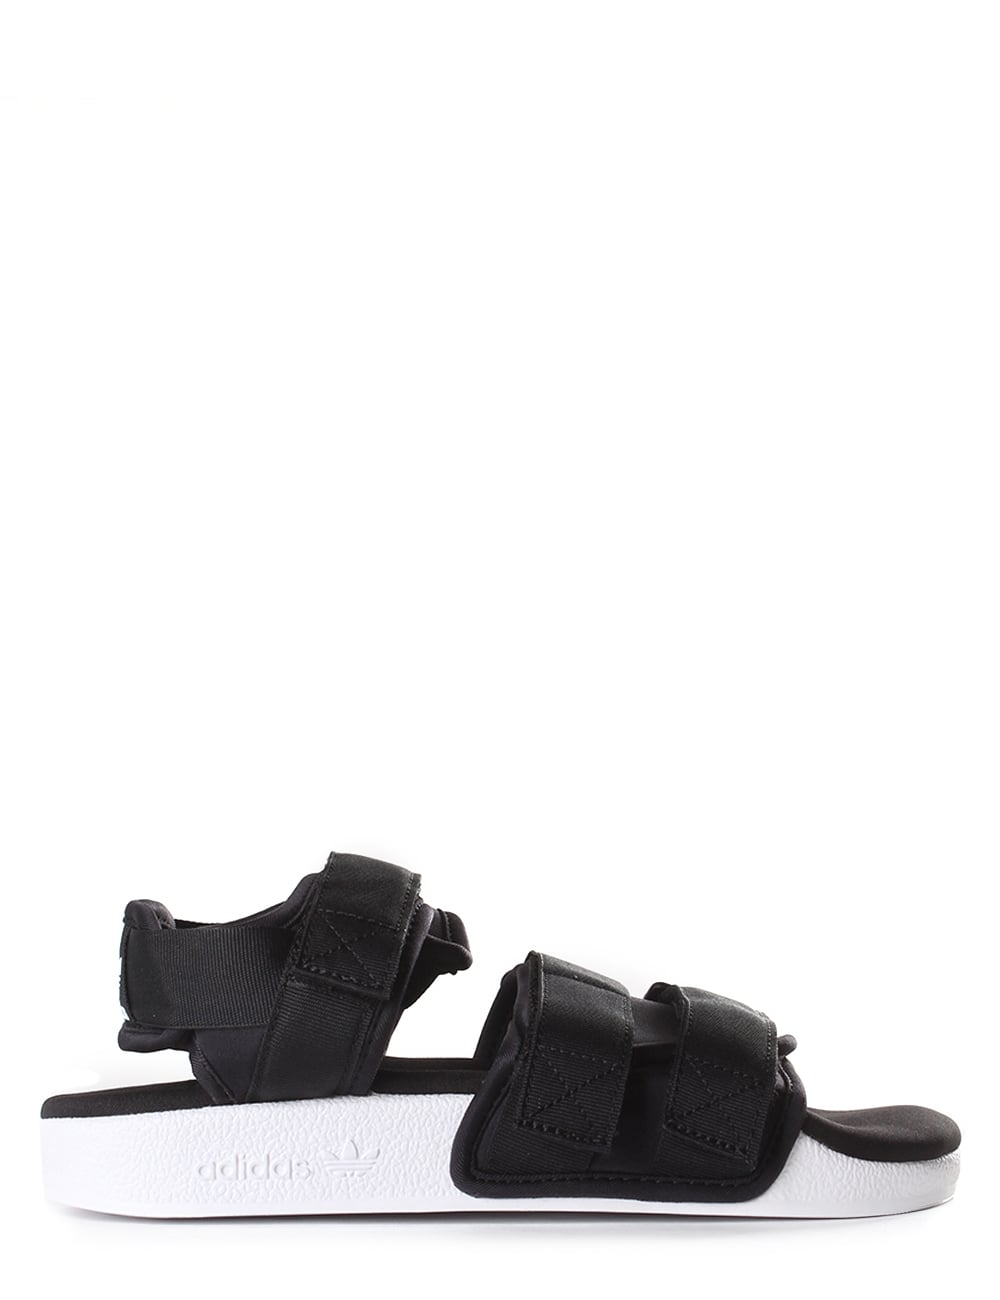 06f5348bbac9e3 Adidas Women s Adilette Sandal Core Black White